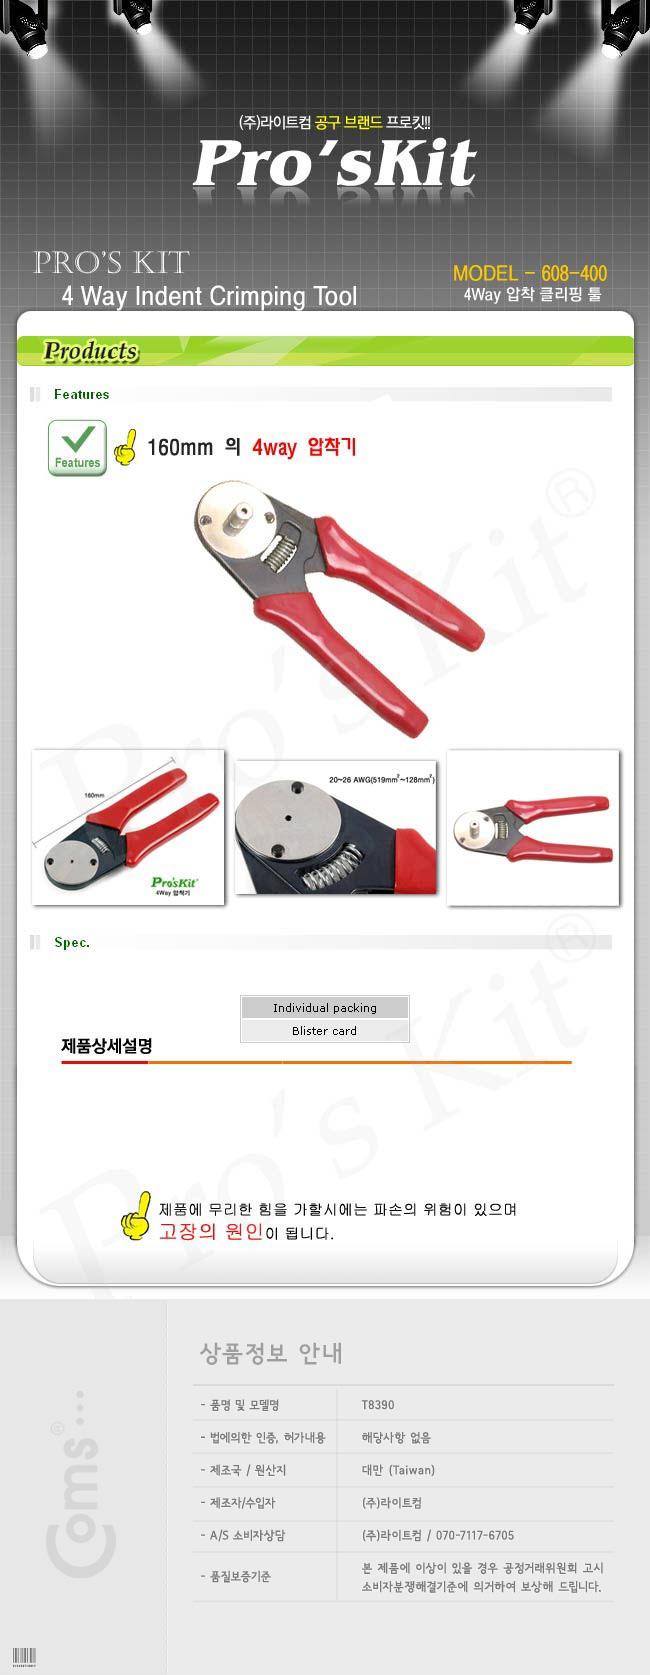 http://www.comsmart.co.kr/product/T8390.jpg